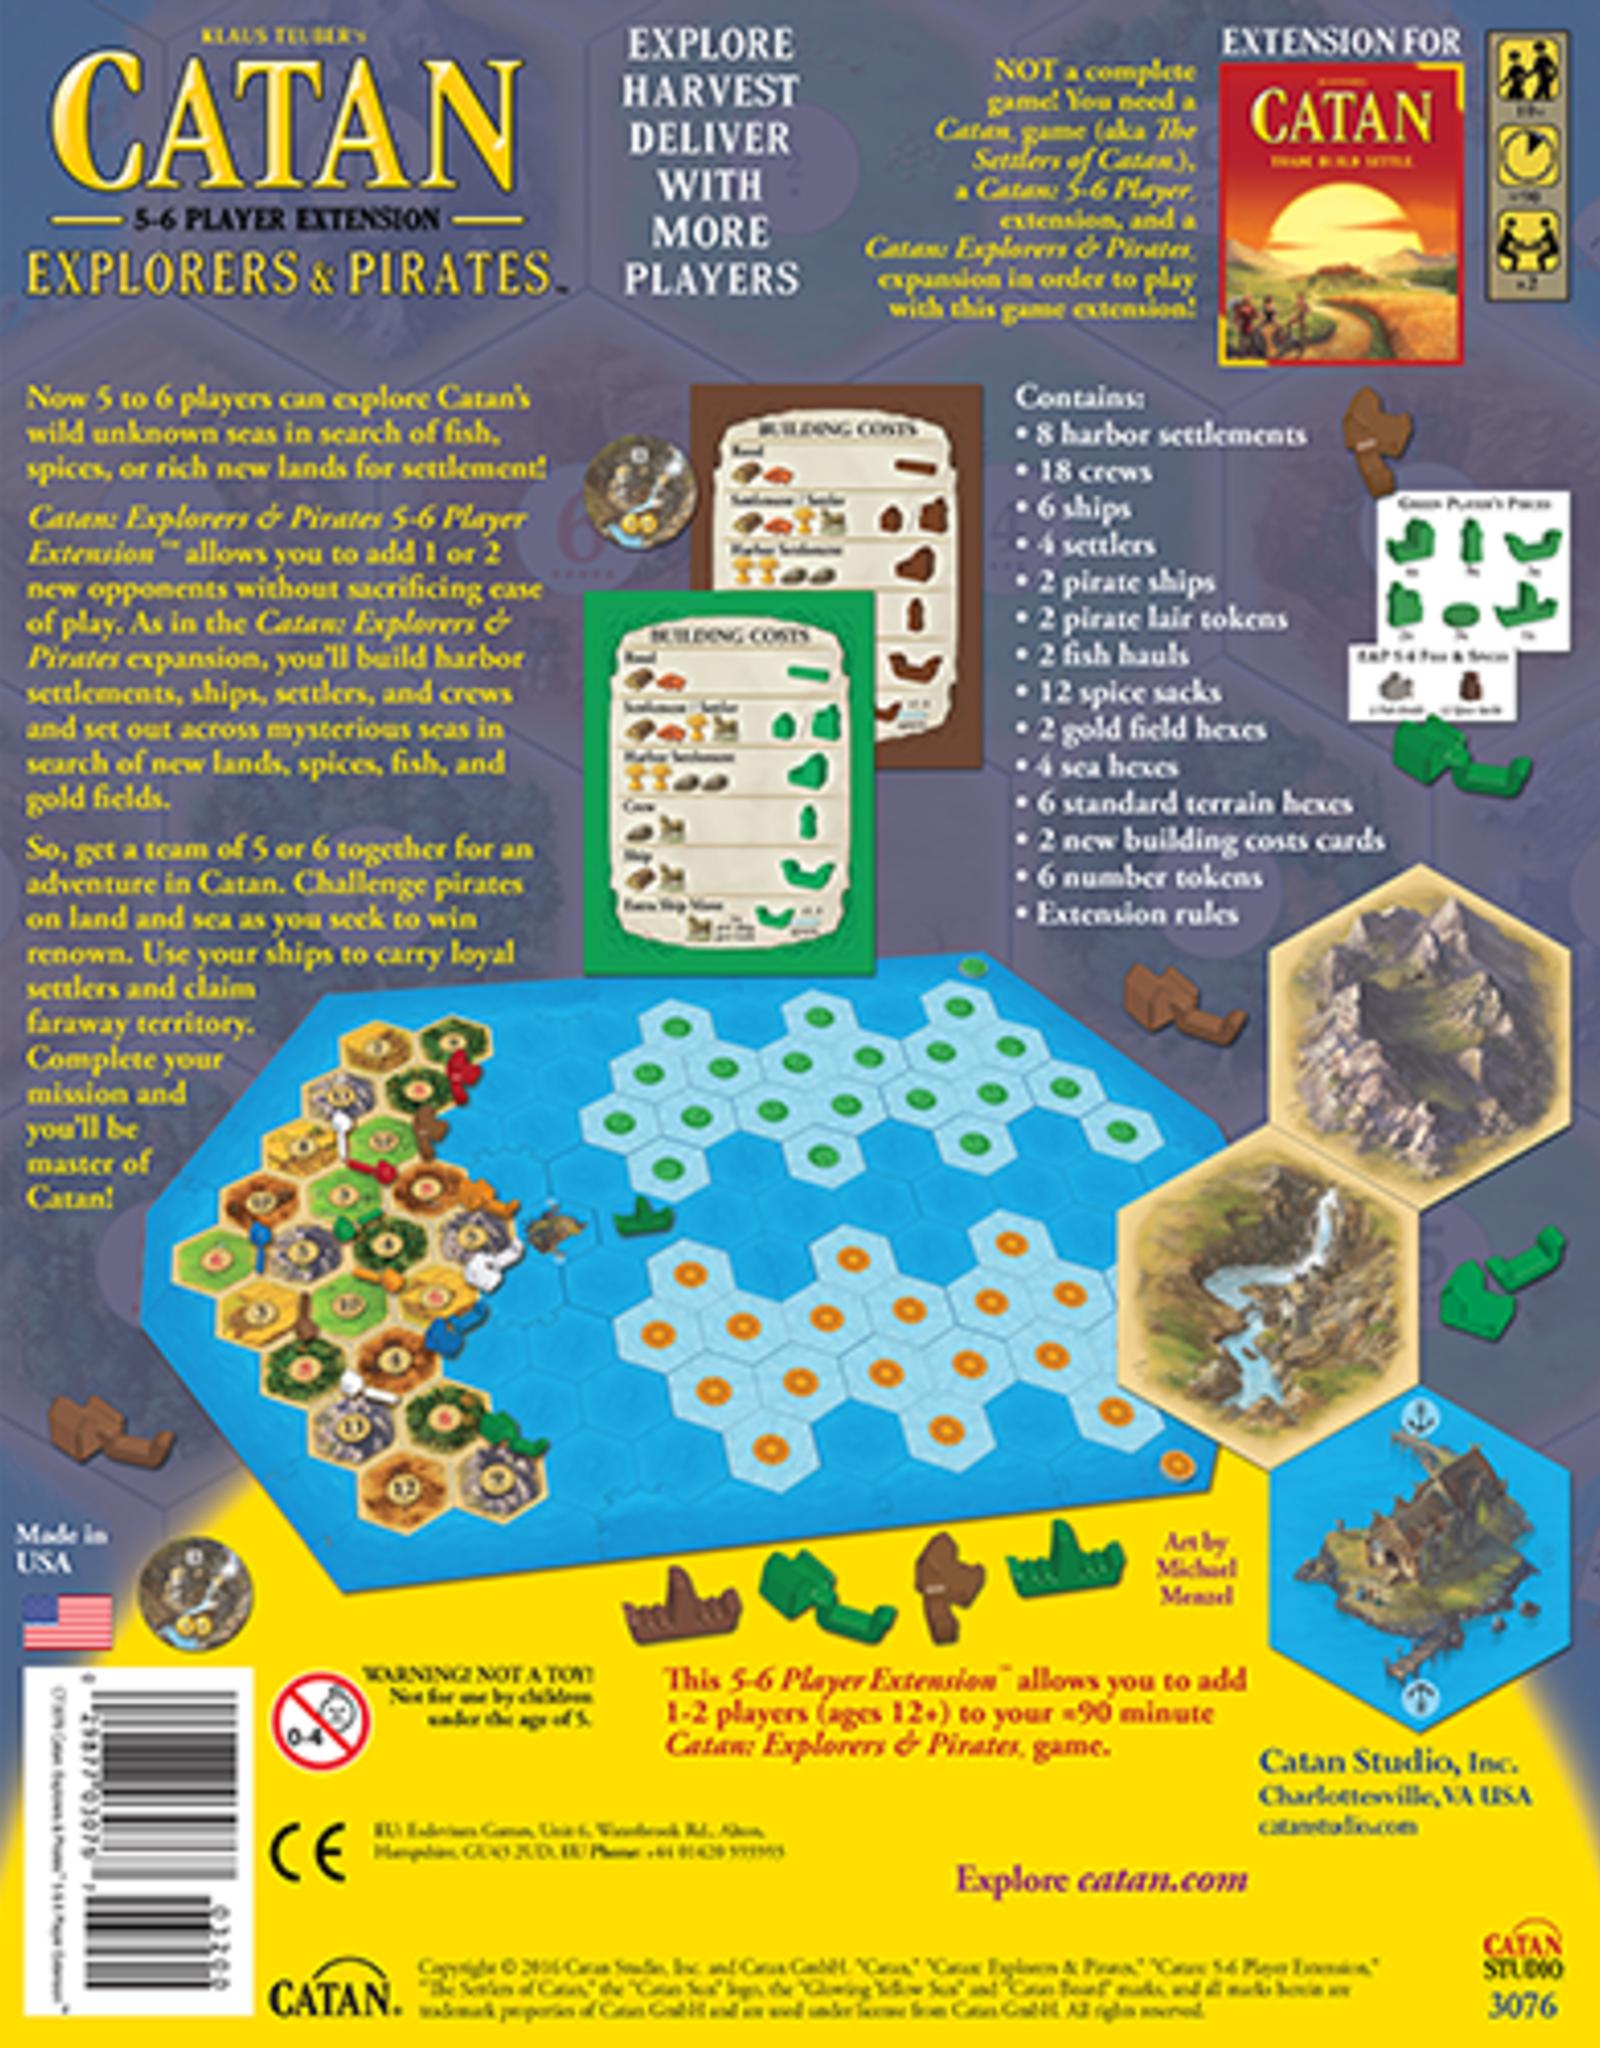 Catan Studios Catan: Explorers & Pirates 5-6 Extension